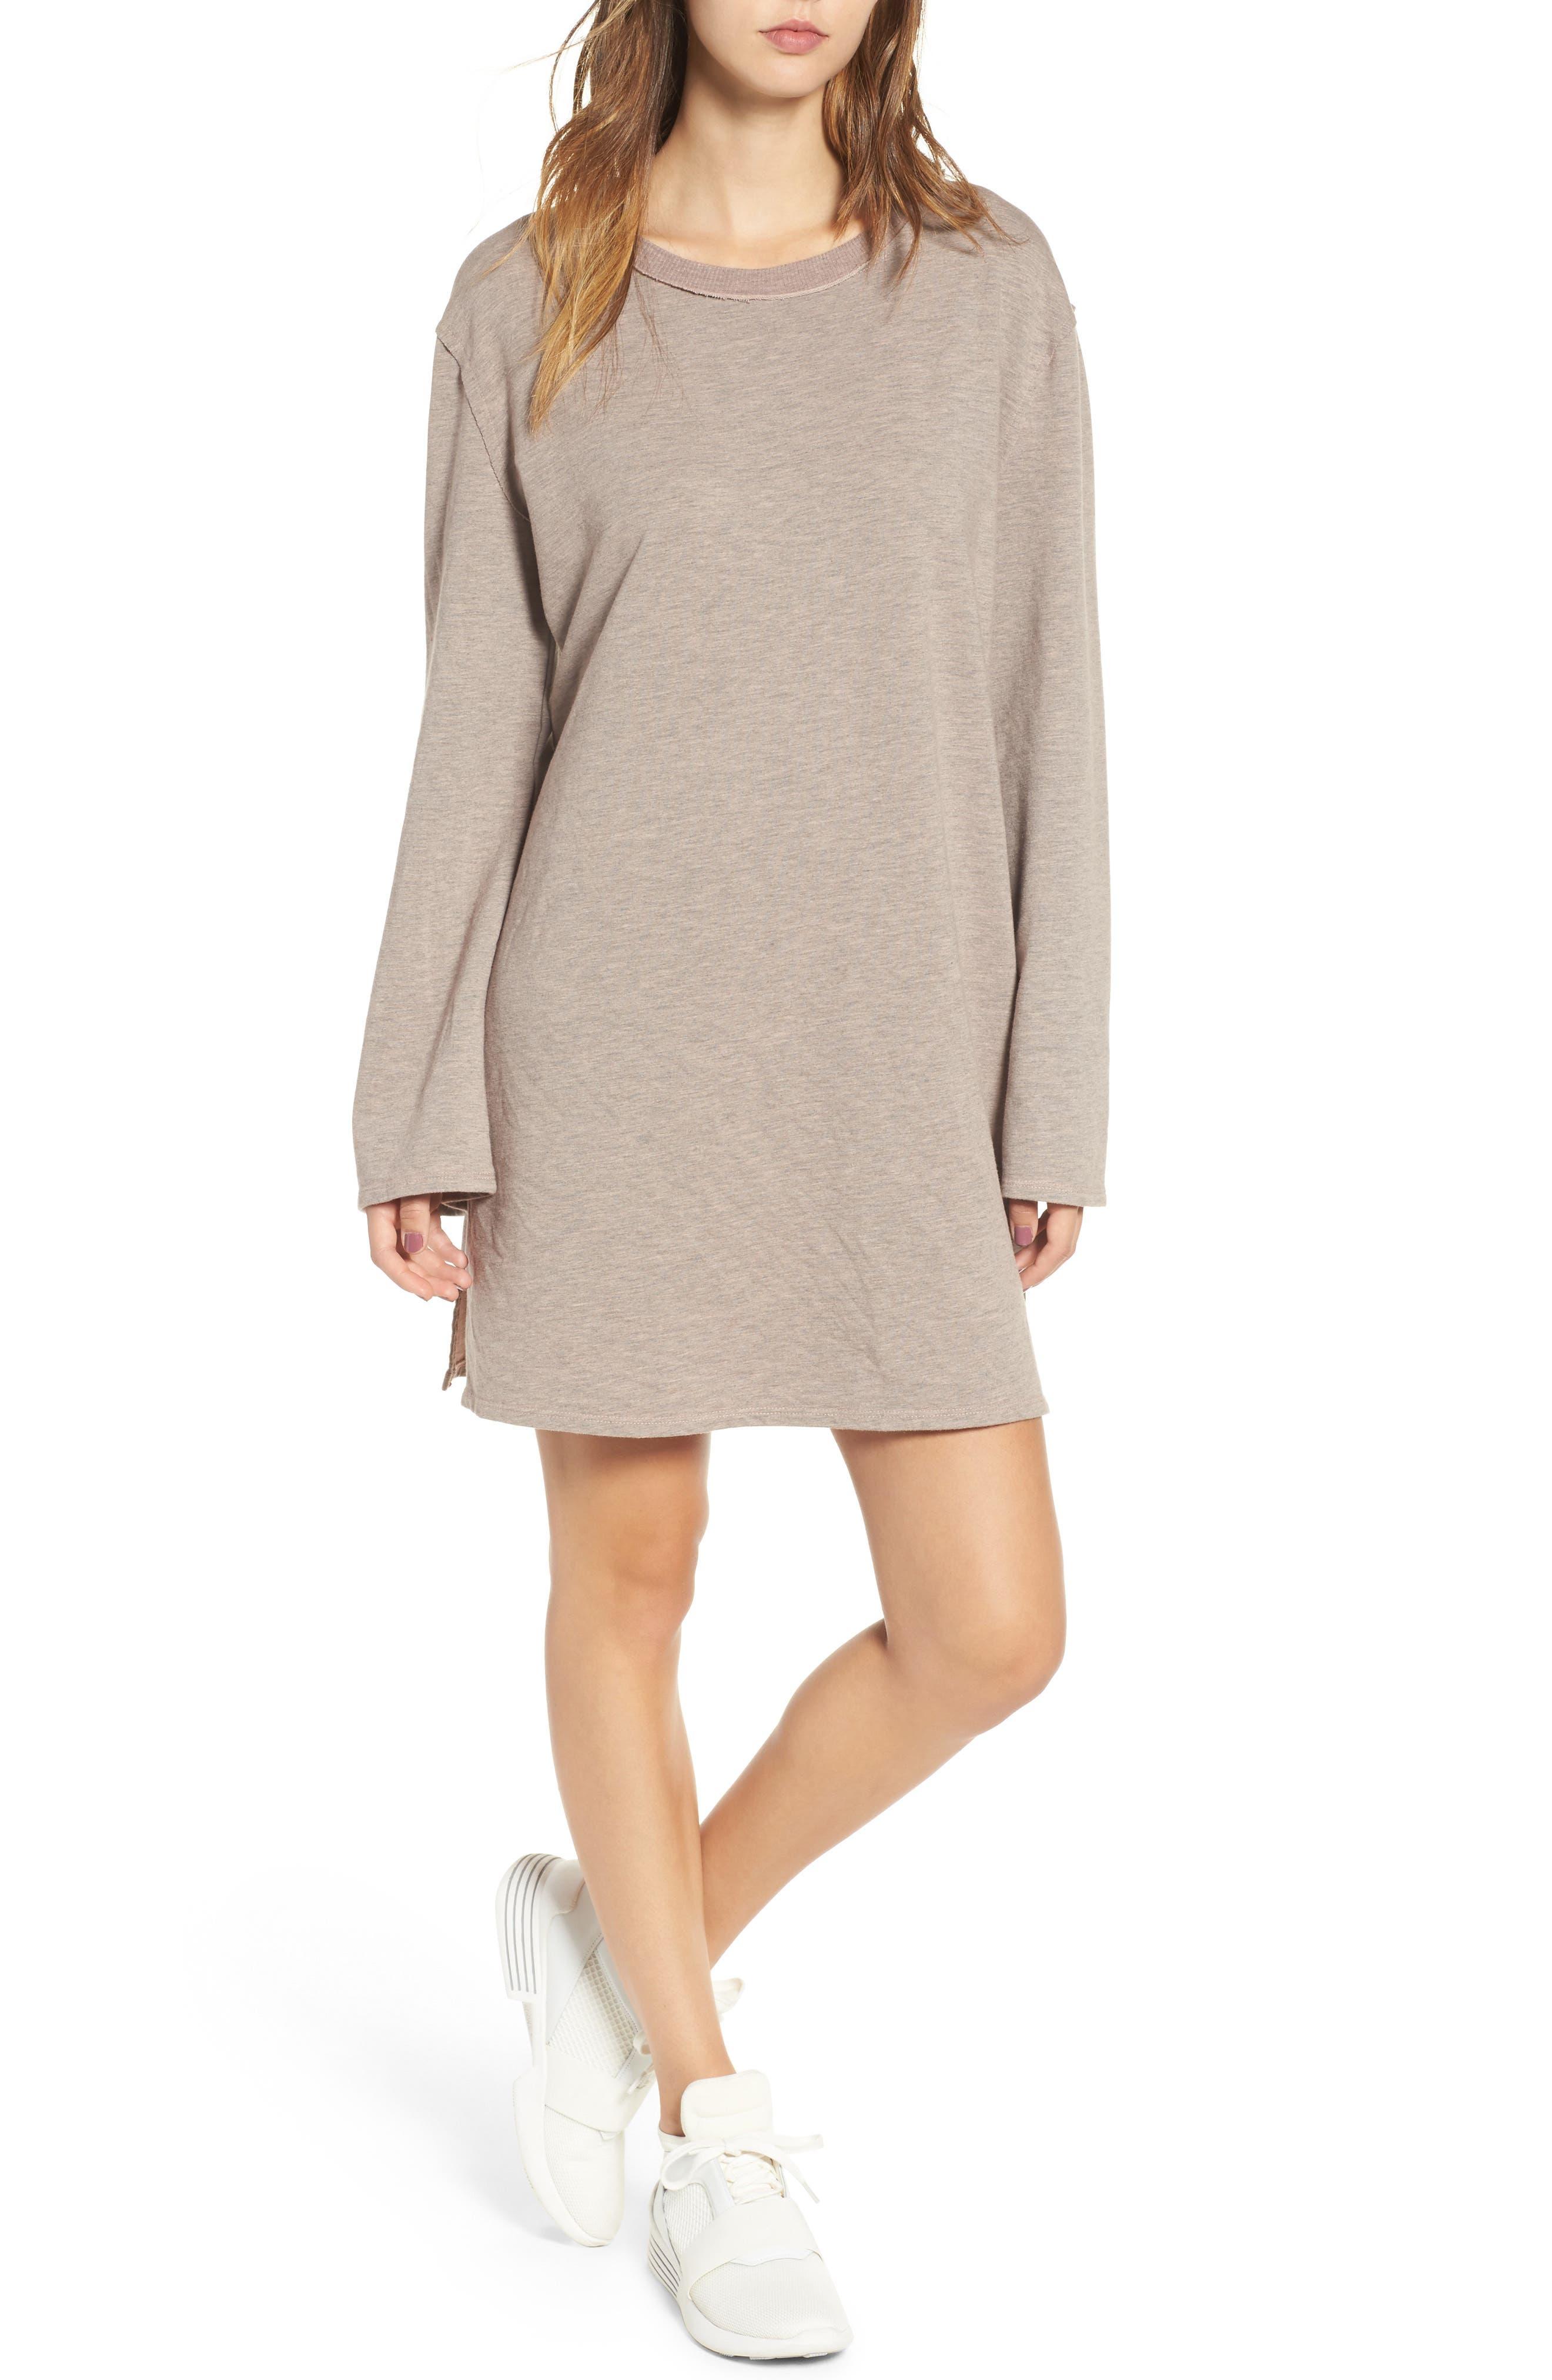 Low Back Sweatshirt Dress,                             Main thumbnail 1, color,                             650